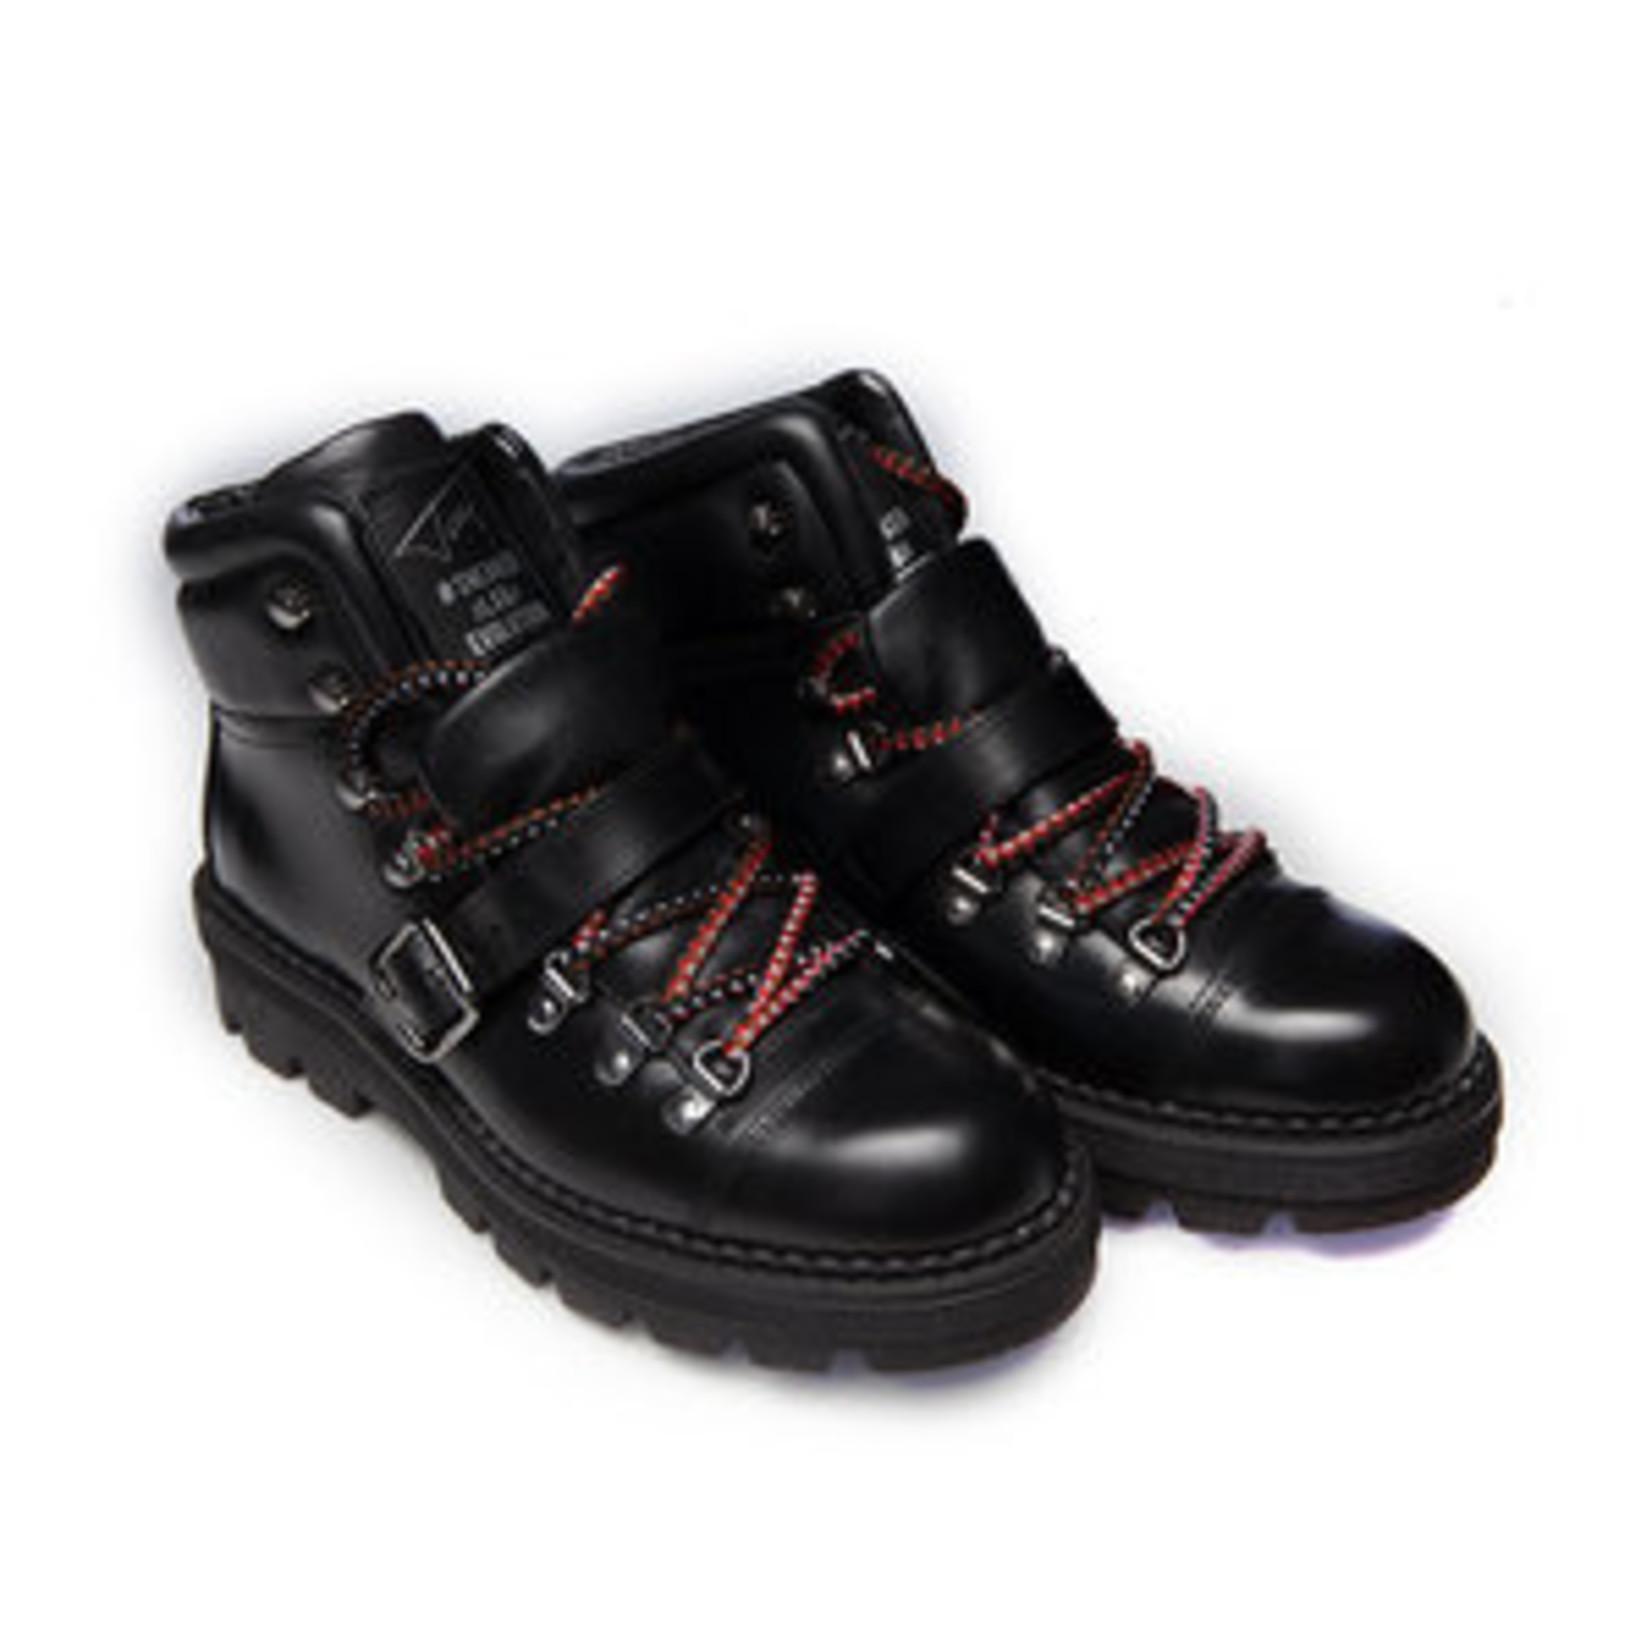 Toral Bergschoen sneaker